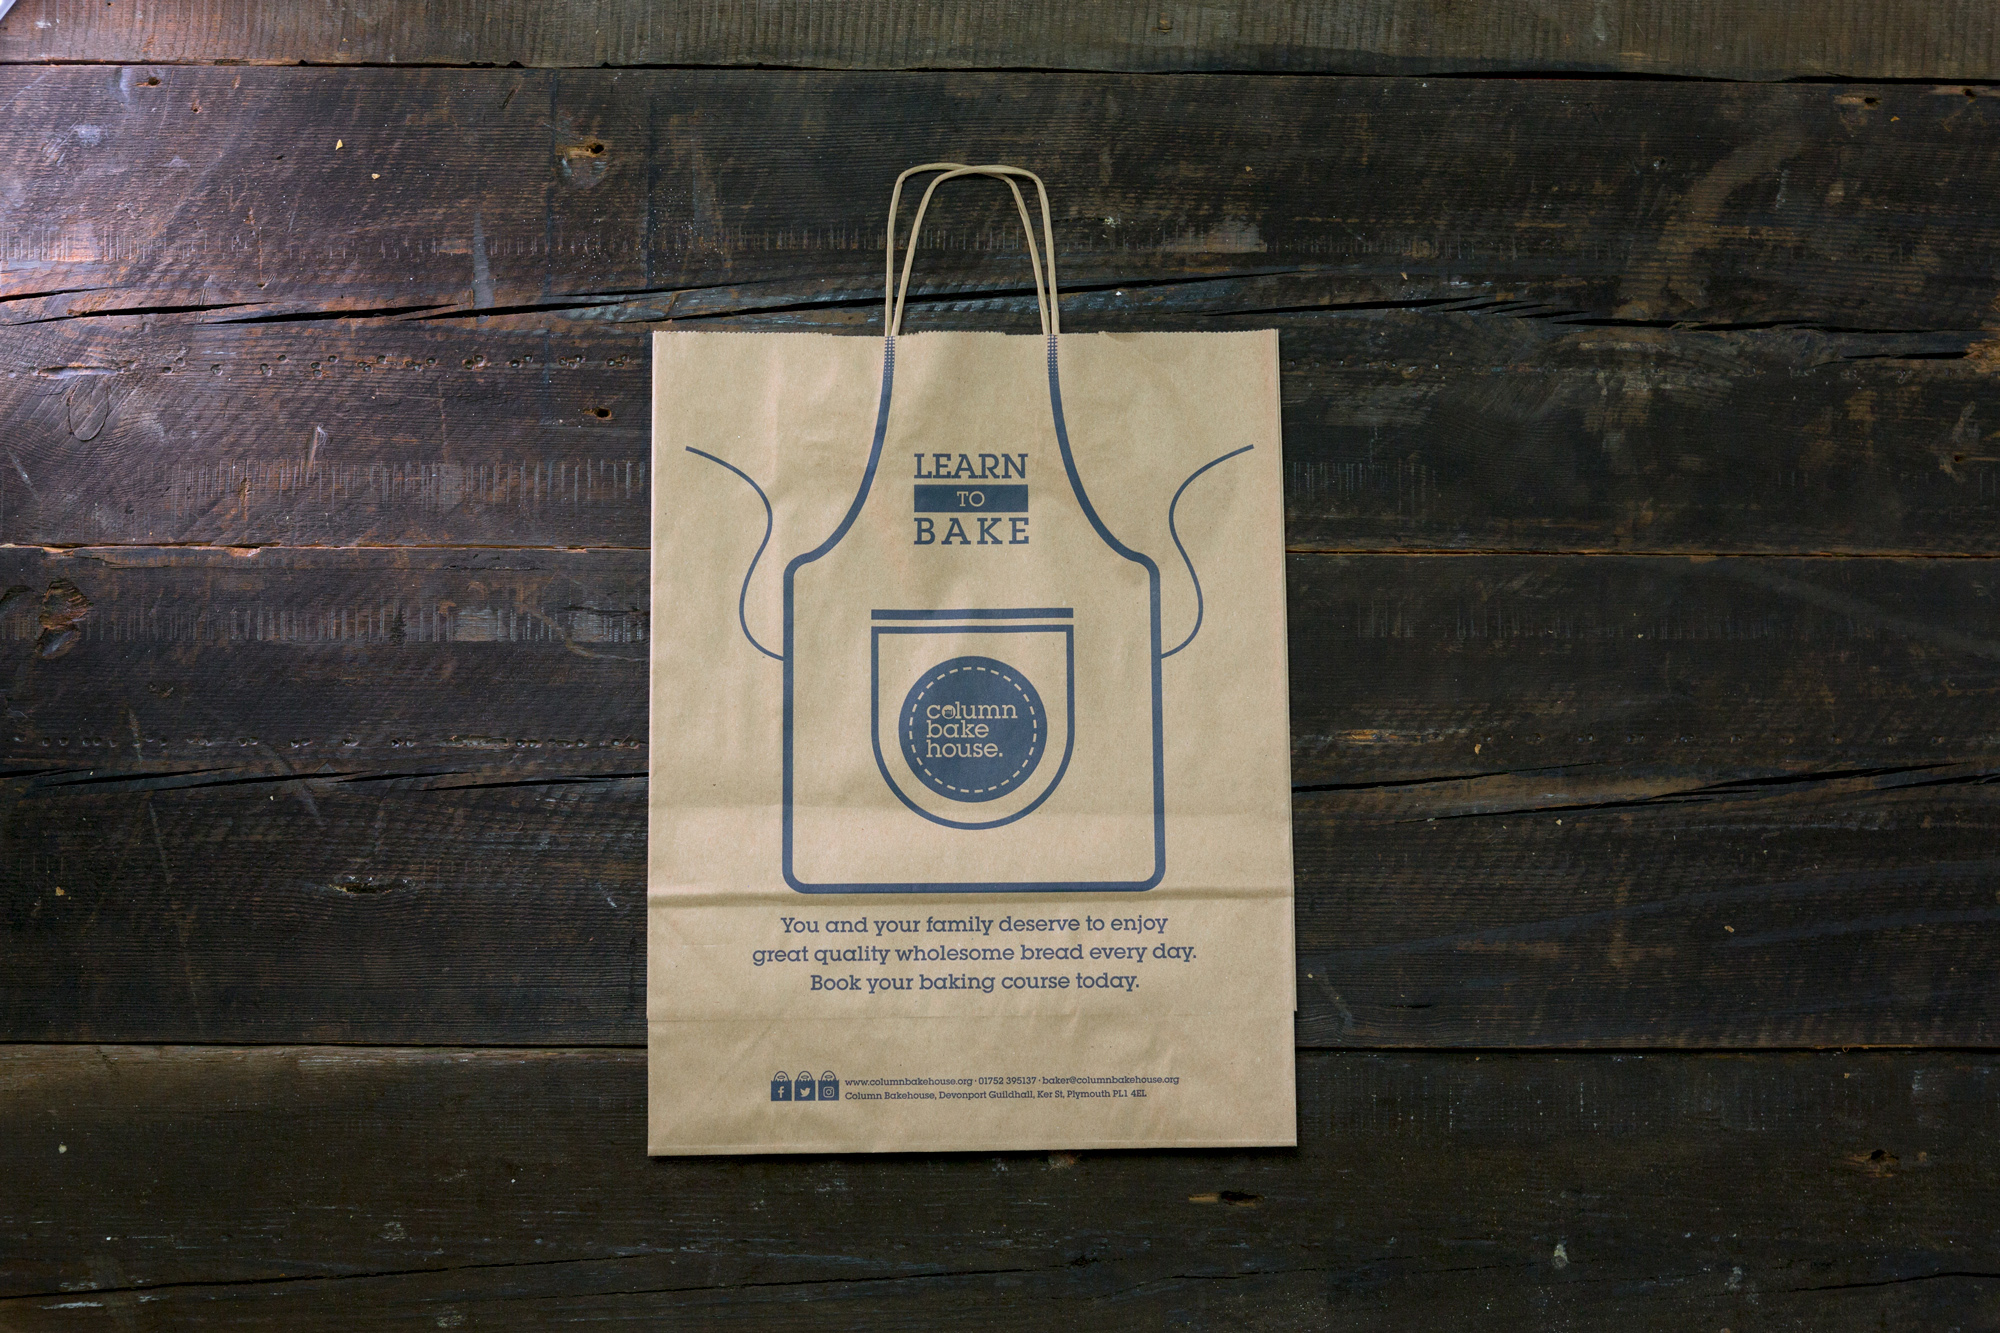 Column-bakehouse-twisted-handle-bags-2017.jpg